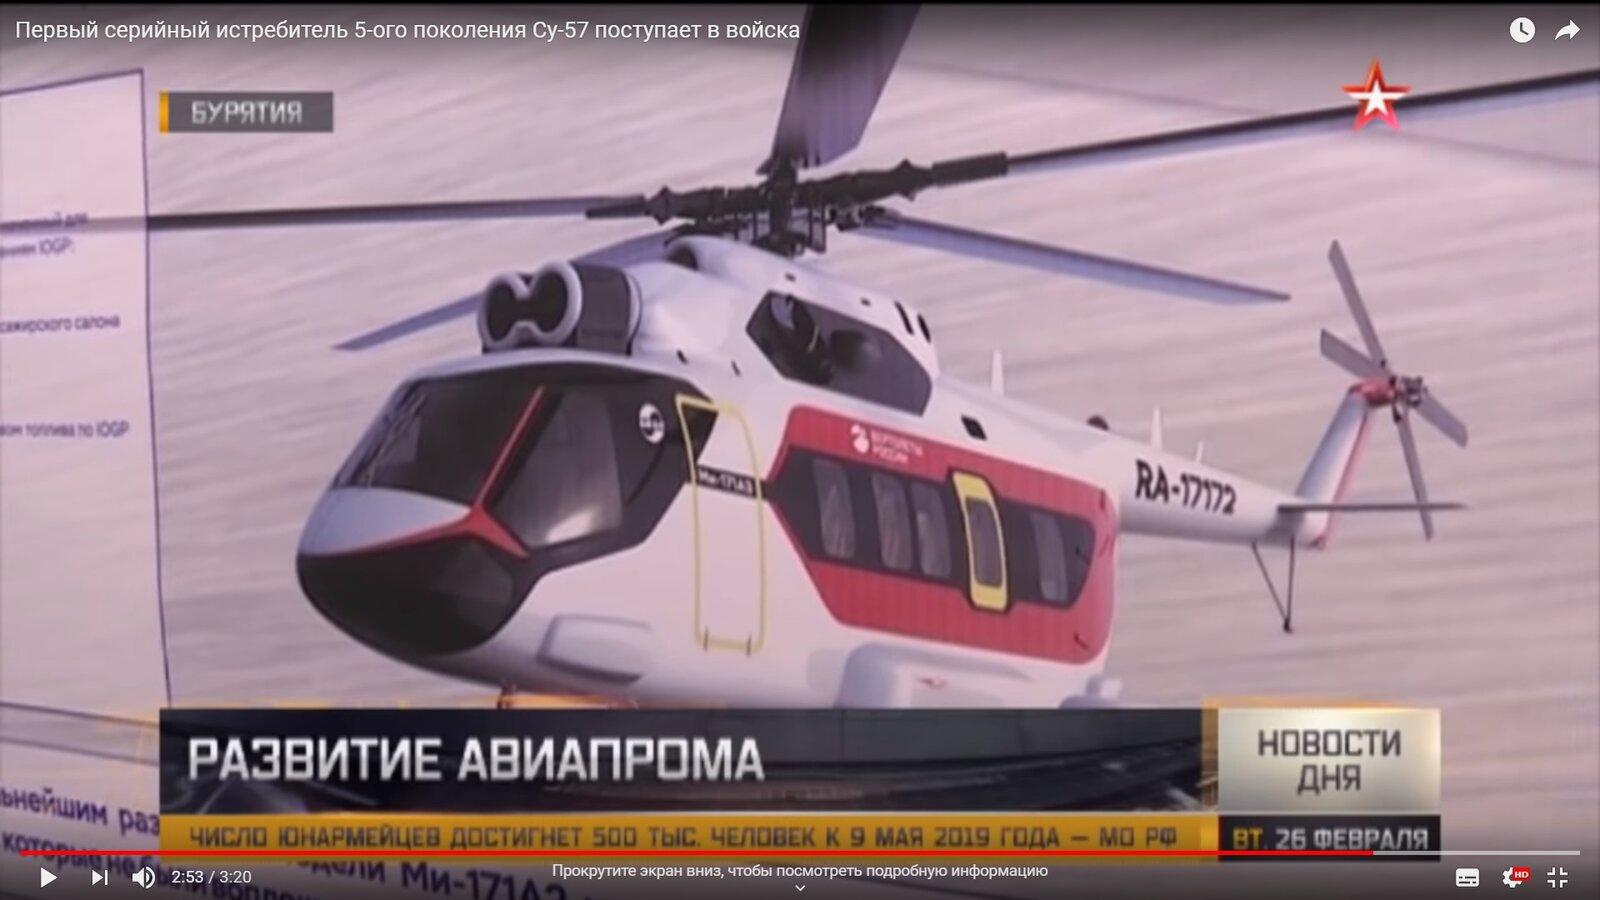 Mi-8/17, Μi-38, Mi-26: News - Page 11 6596029_original